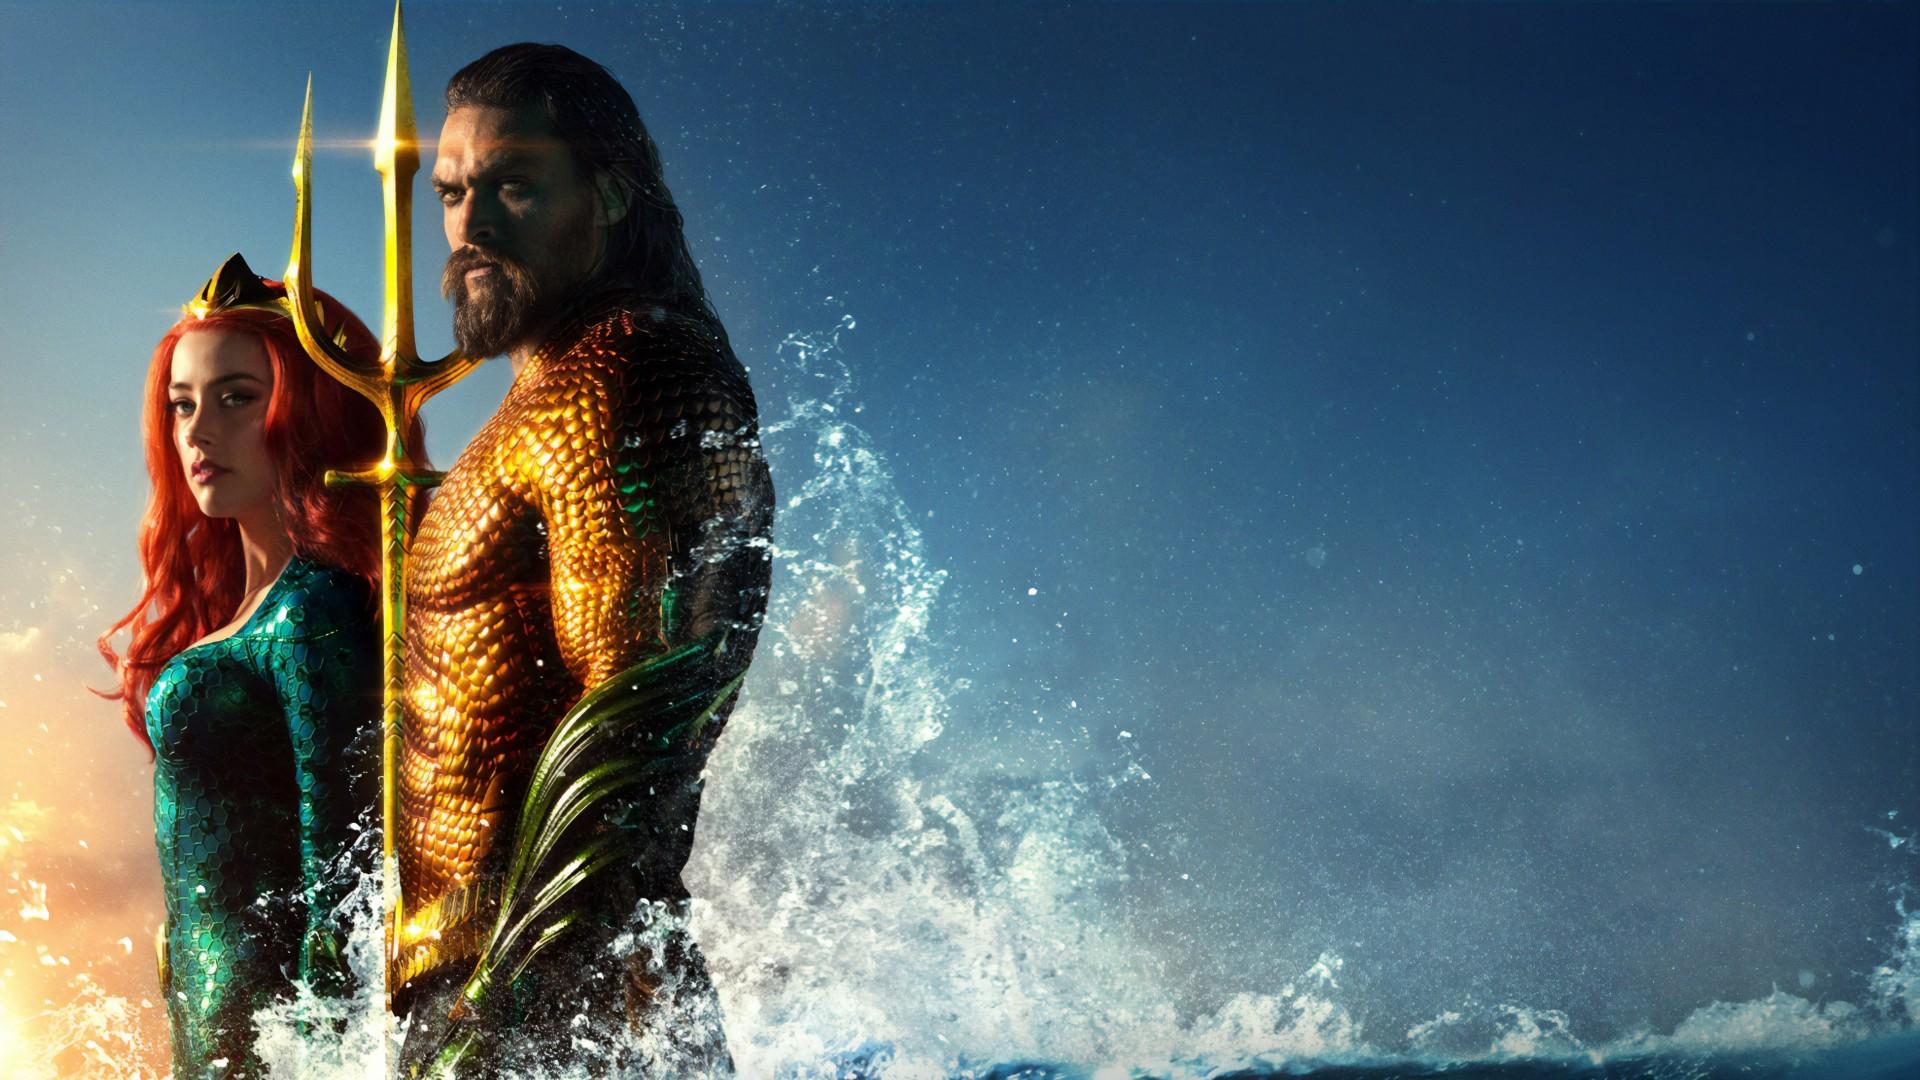 Apple Iphone 5s Wallpaper Hd Download Mera Amp Aquaman In Aquaman 5k Wallpapers Hd Wallpapers